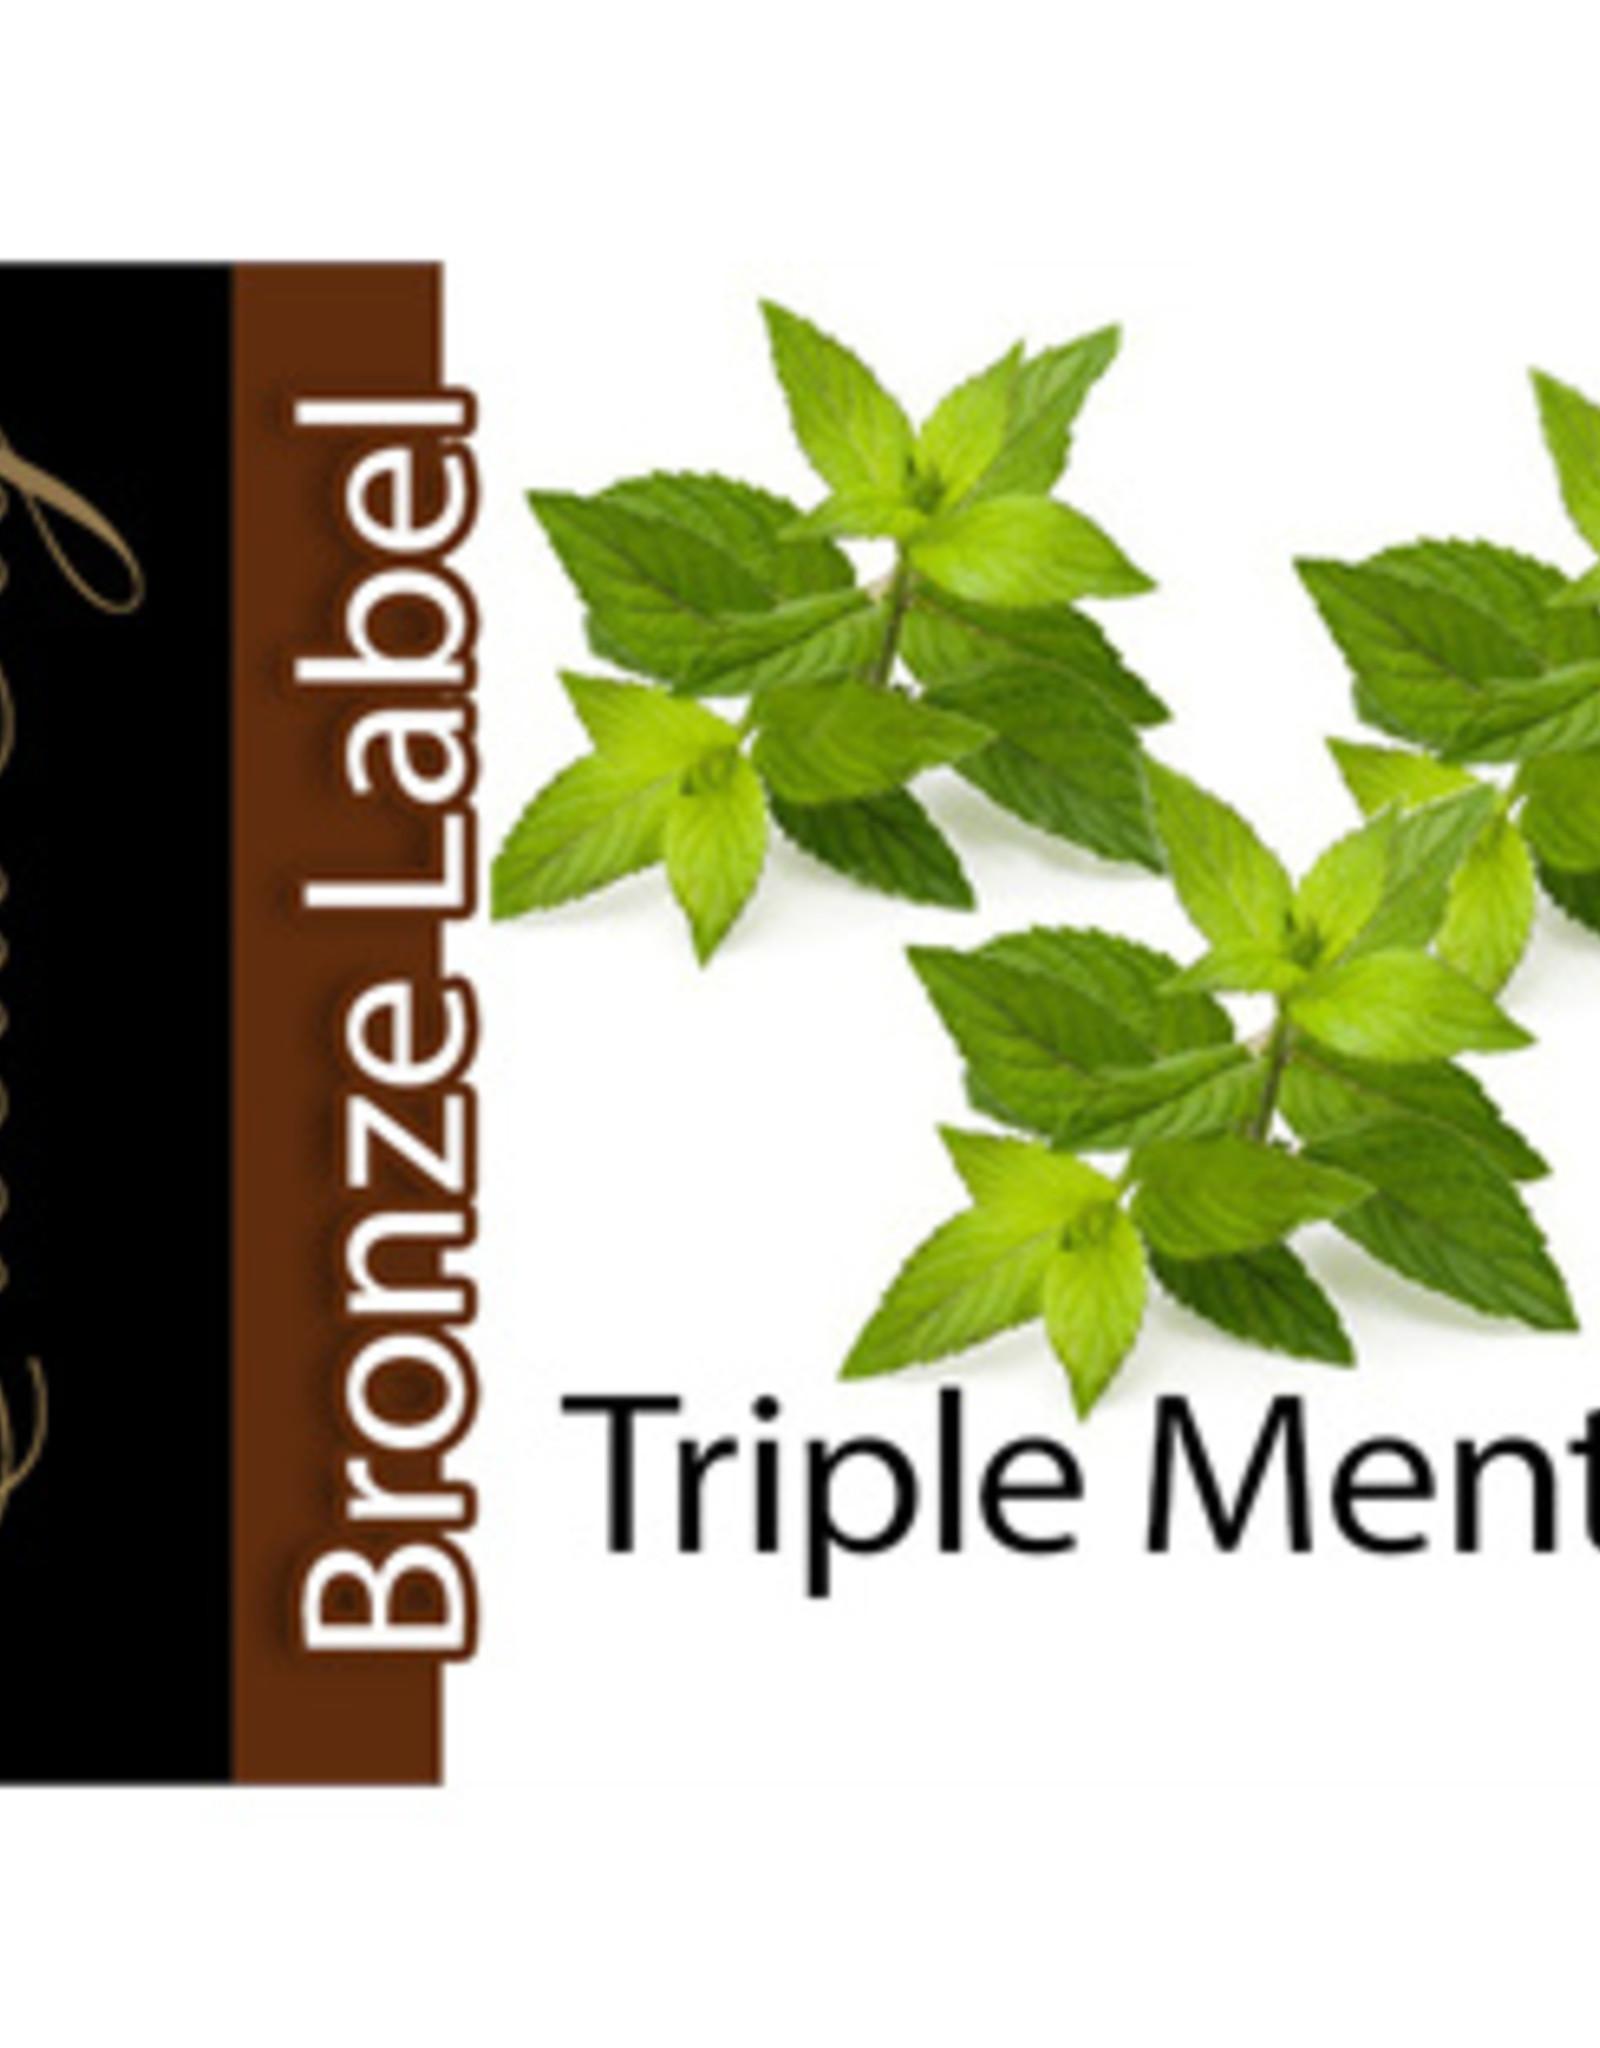 Exclucig Exclucig Bronze Label E-liquid Triple Menthol 3 mg Nicotine